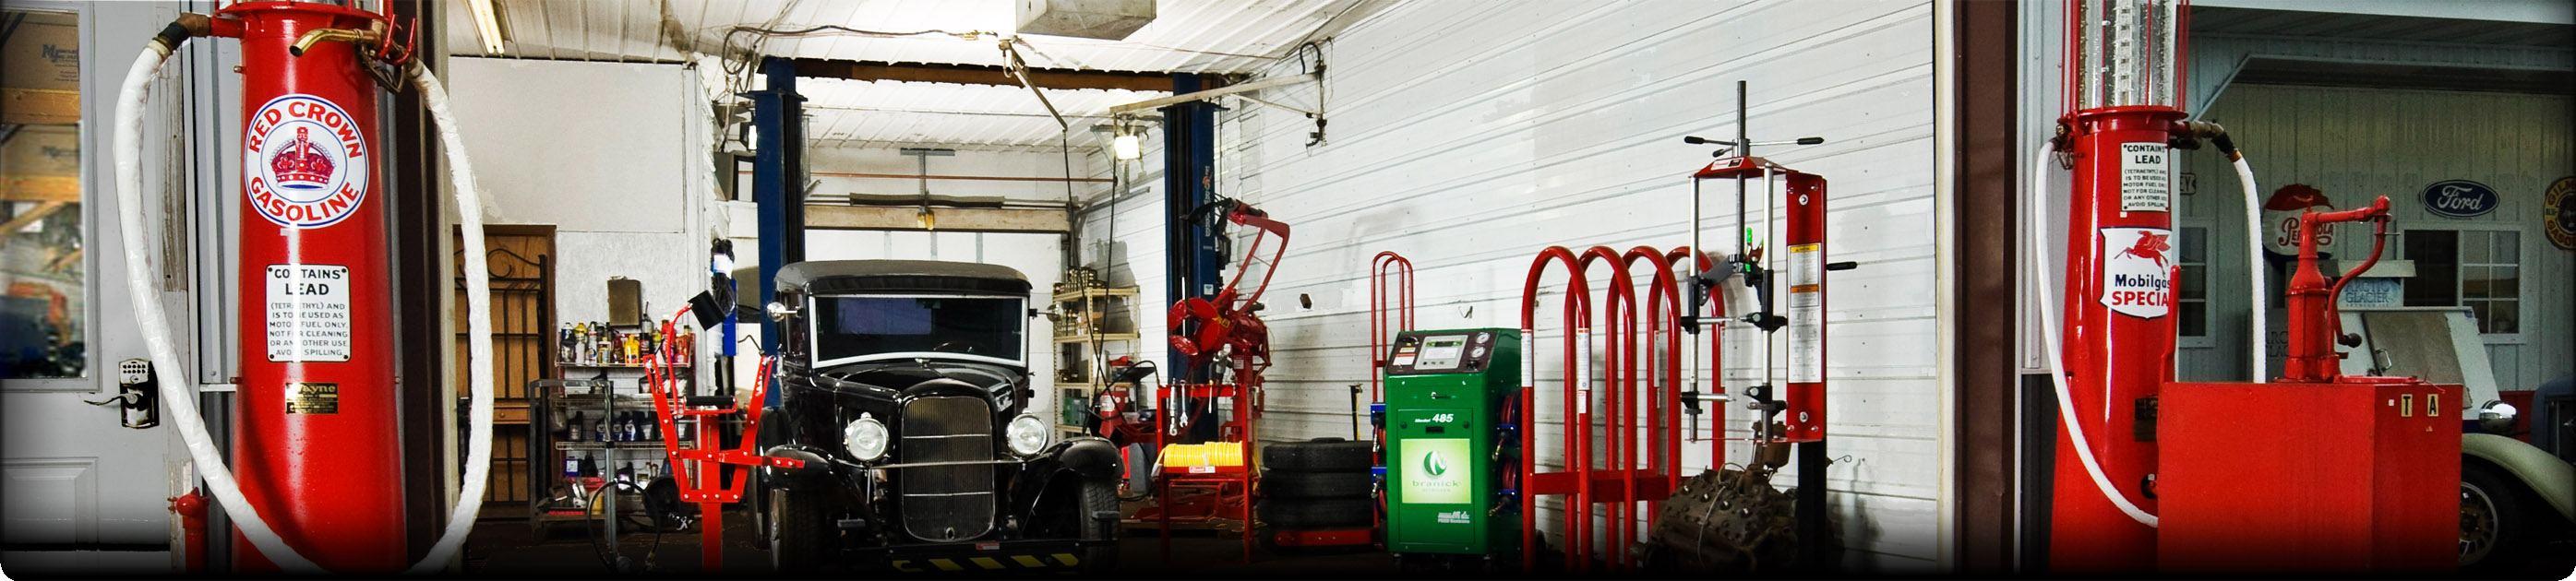 Branick Tools and Equipment